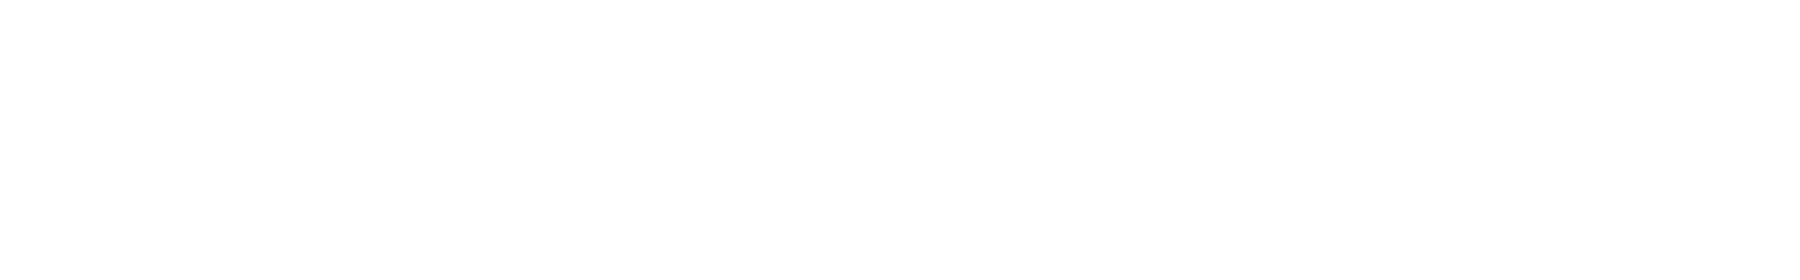 dp sequence apreg loop18